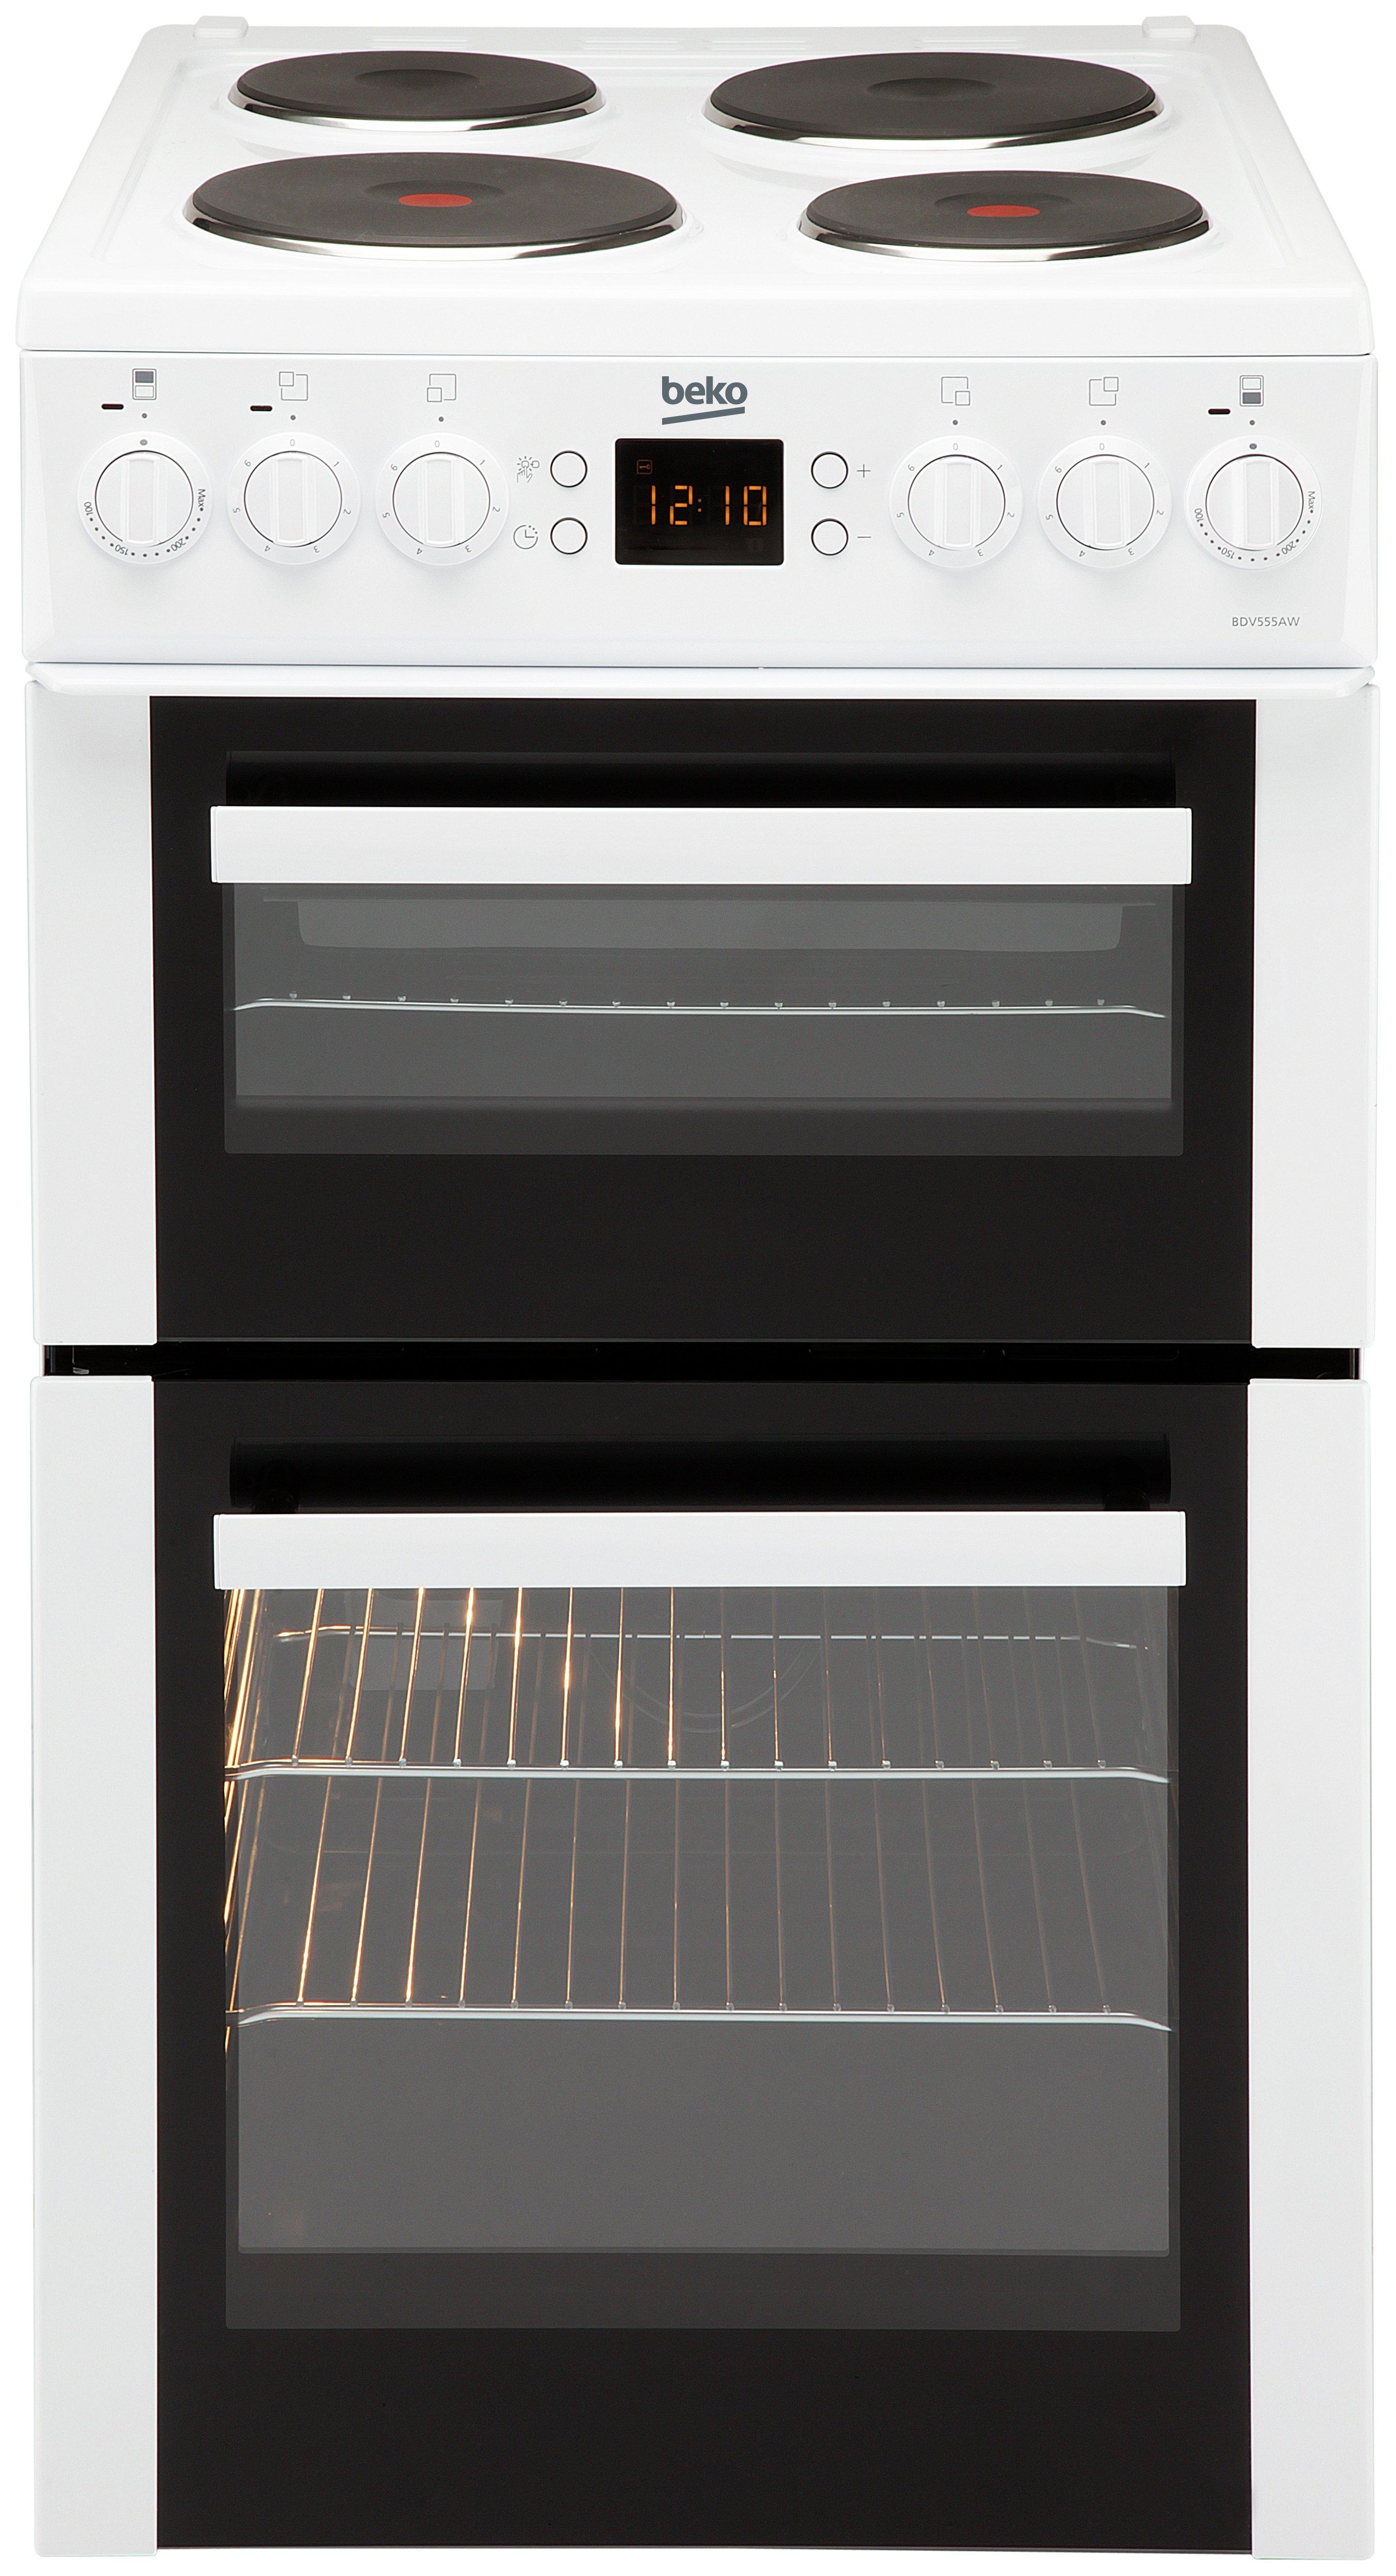 buy indesit freestanding cookers at your. Black Bedroom Furniture Sets. Home Design Ideas